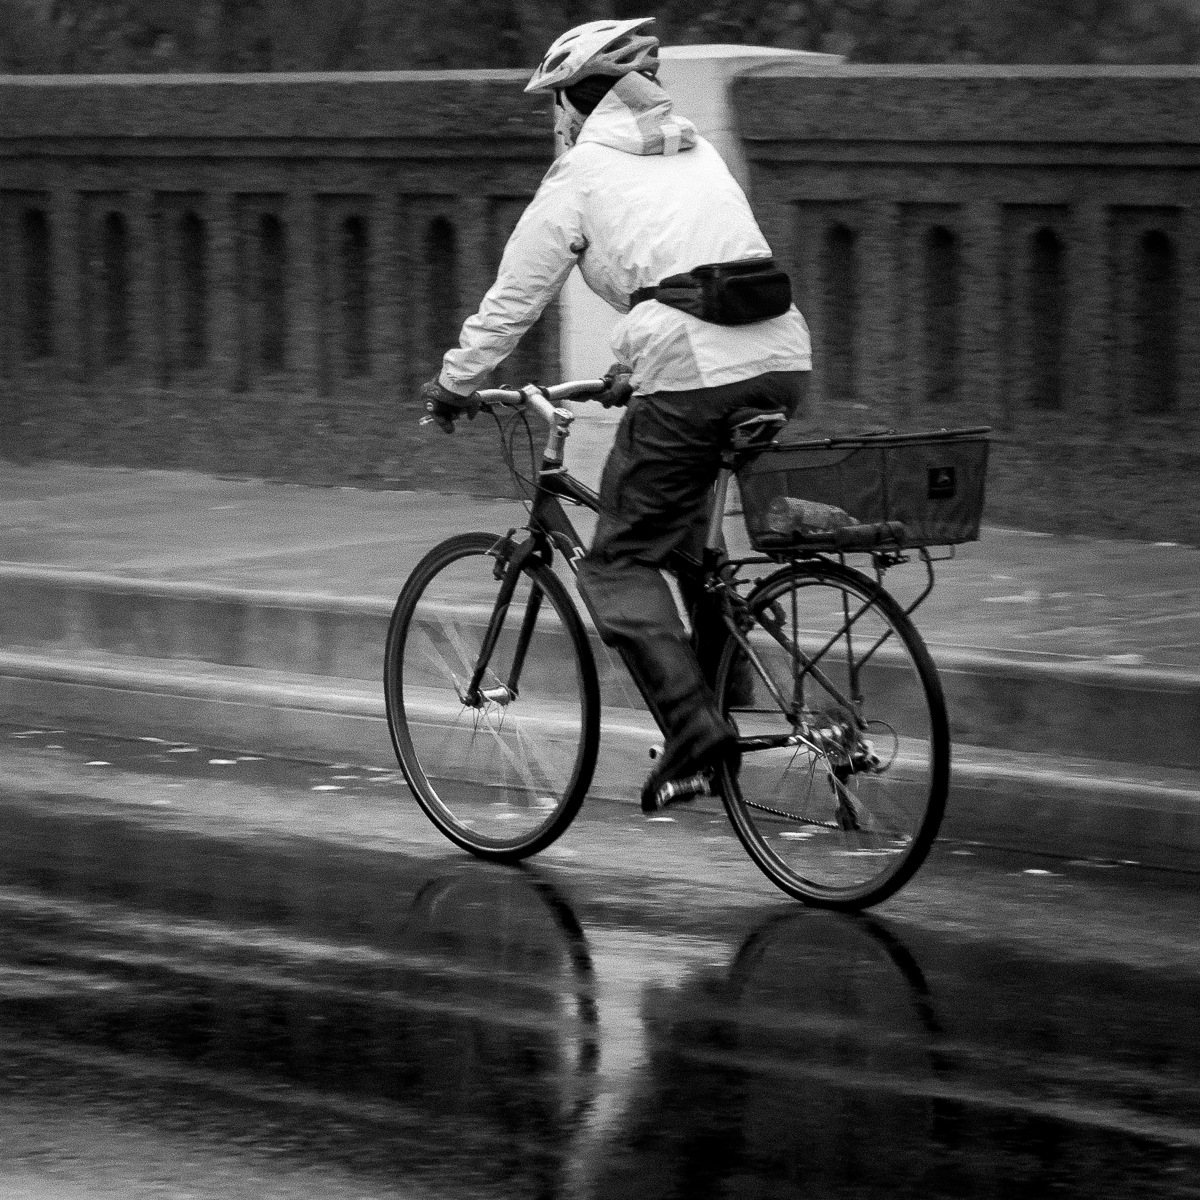 The rain won't stop me by Salam Yahya